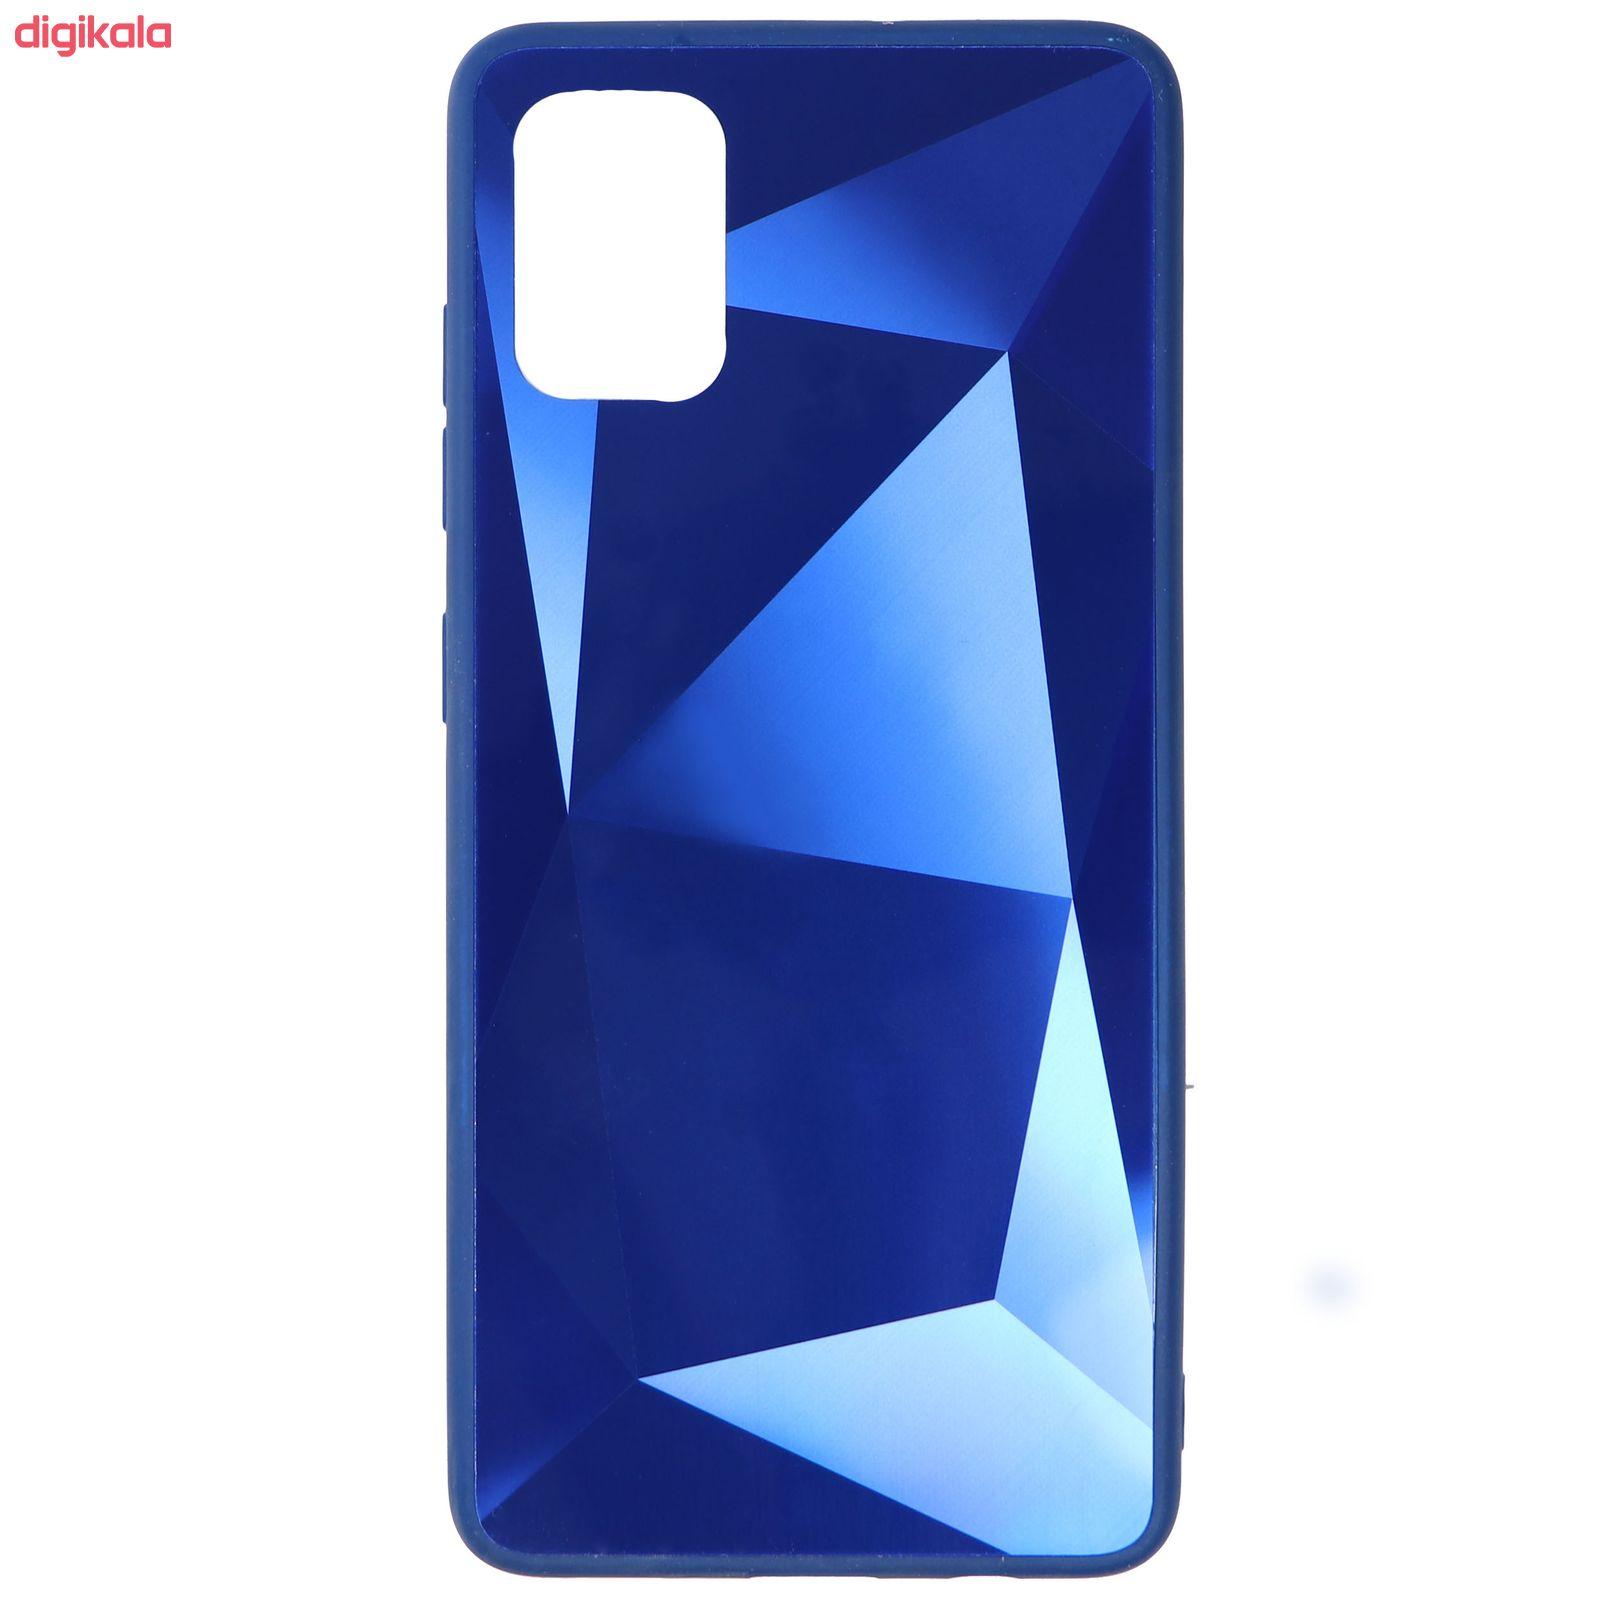 کاور مدل a-1 طرح الماس مناسب برای گوشی موبایل سامسونگ Galaxy A51  main 1 2